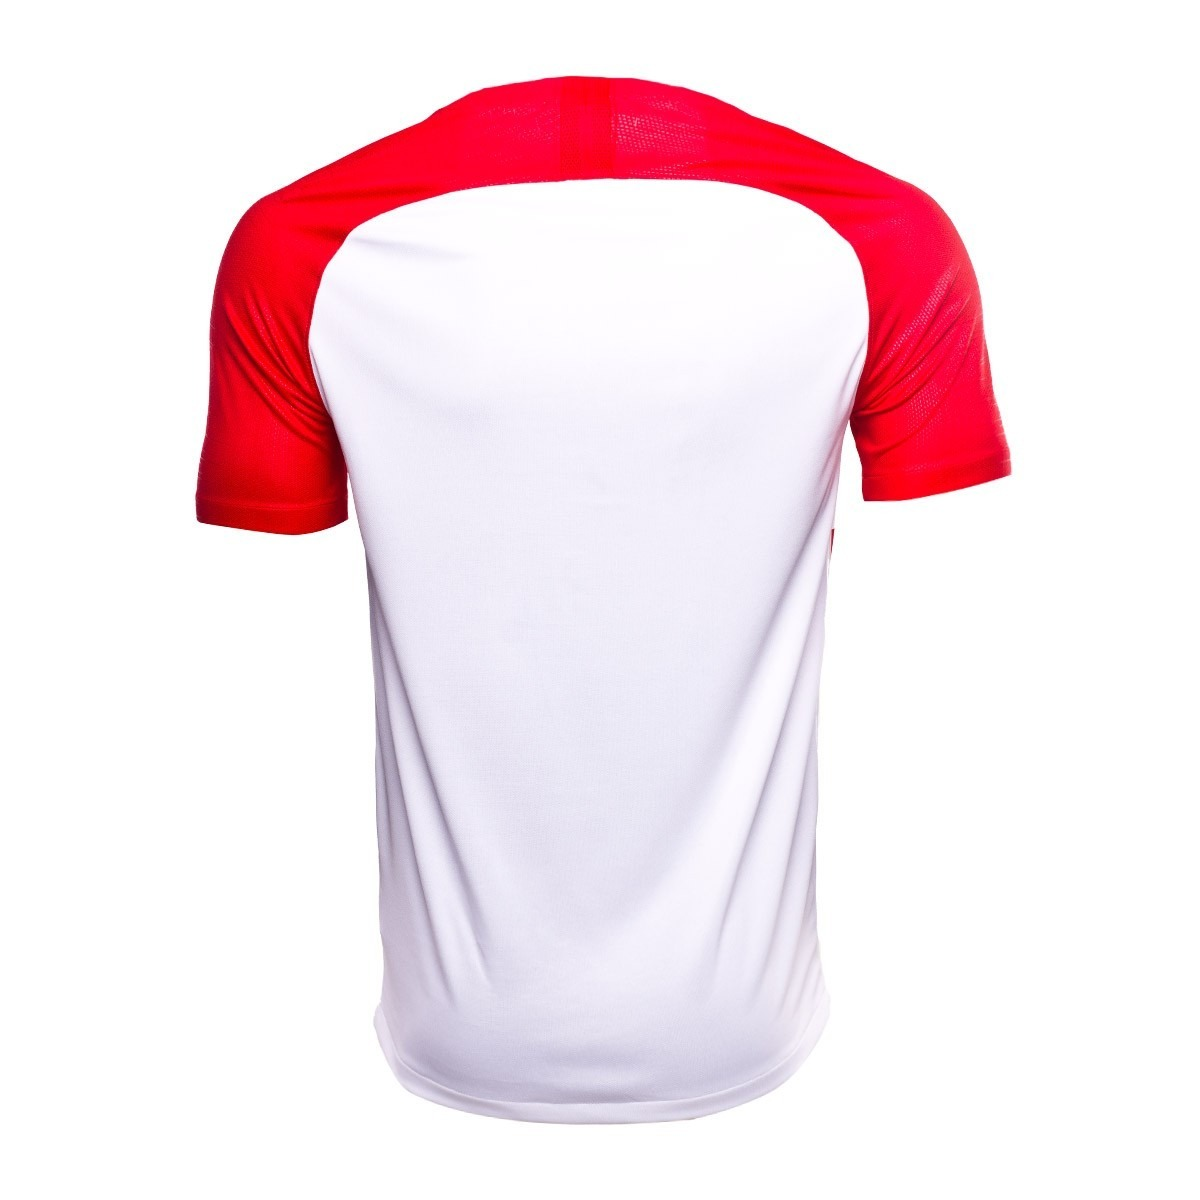 6d04776a8791c camiseta croacia titular 2018 mundial rusia. Cargando zoom.